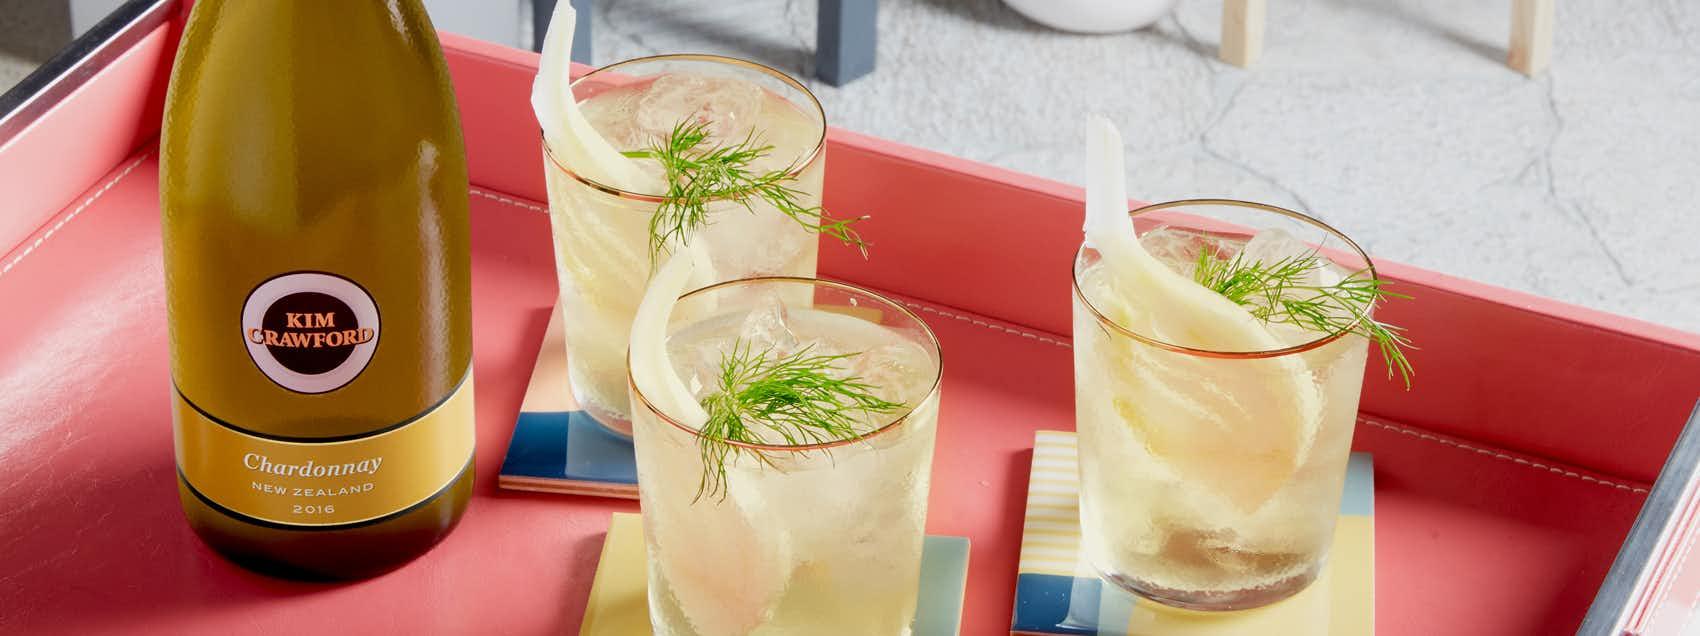 Fennel Fizz Cocktail